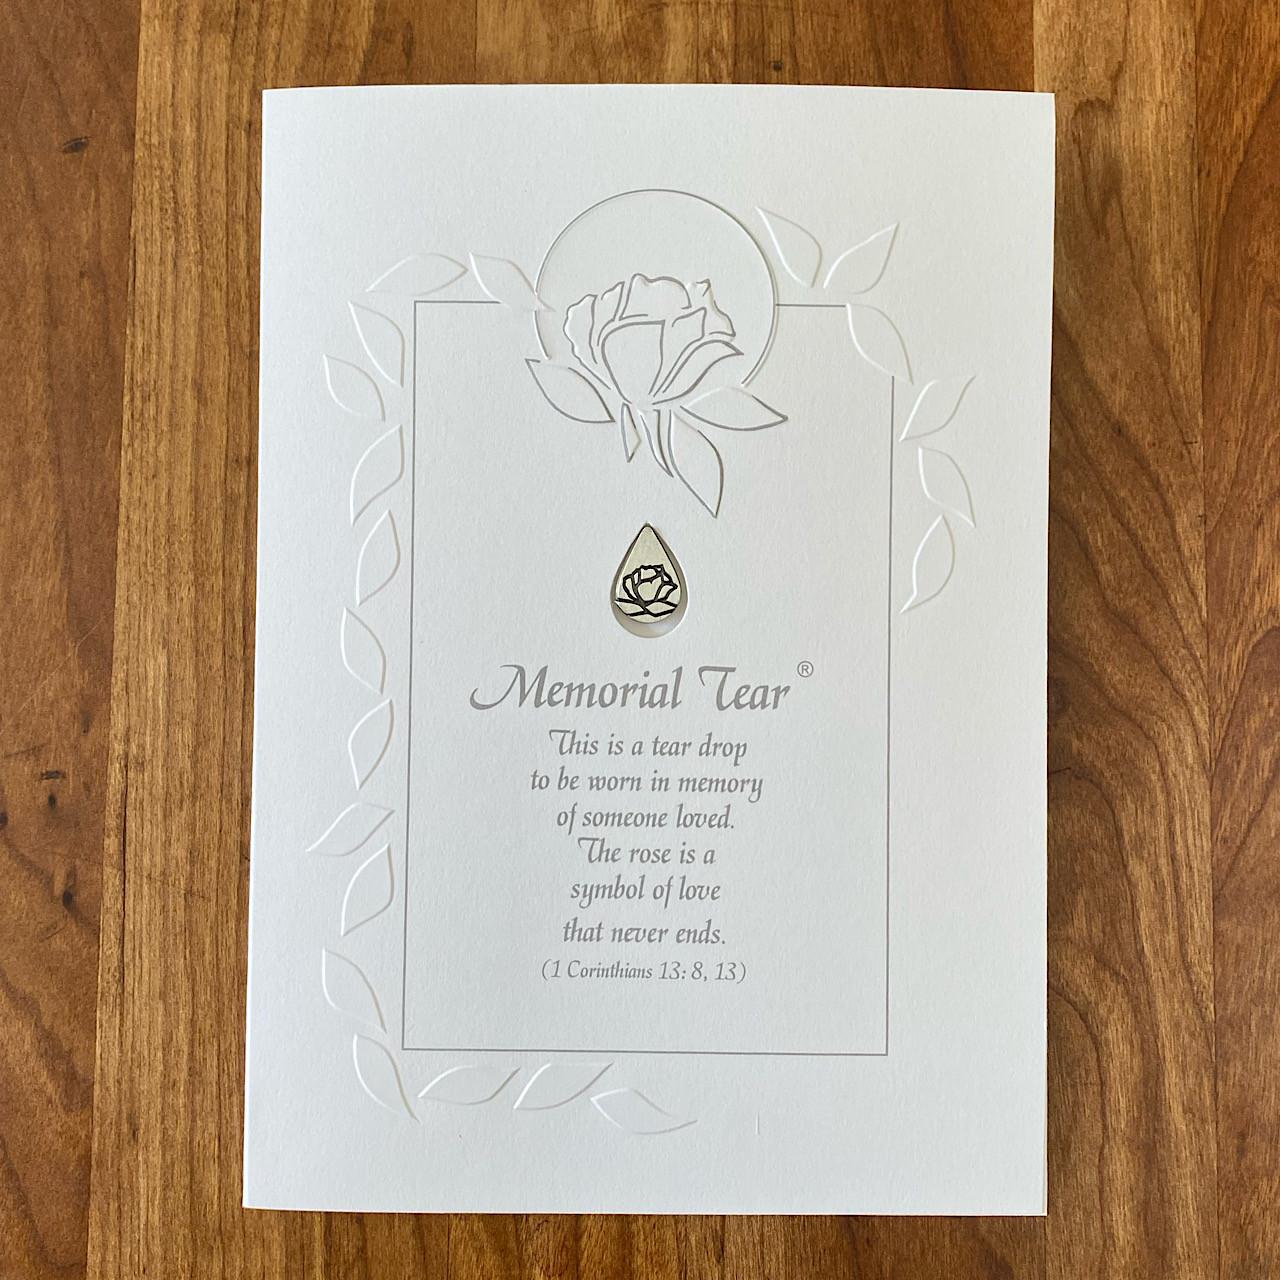 Sympathy Card with Memorial Tear Pin